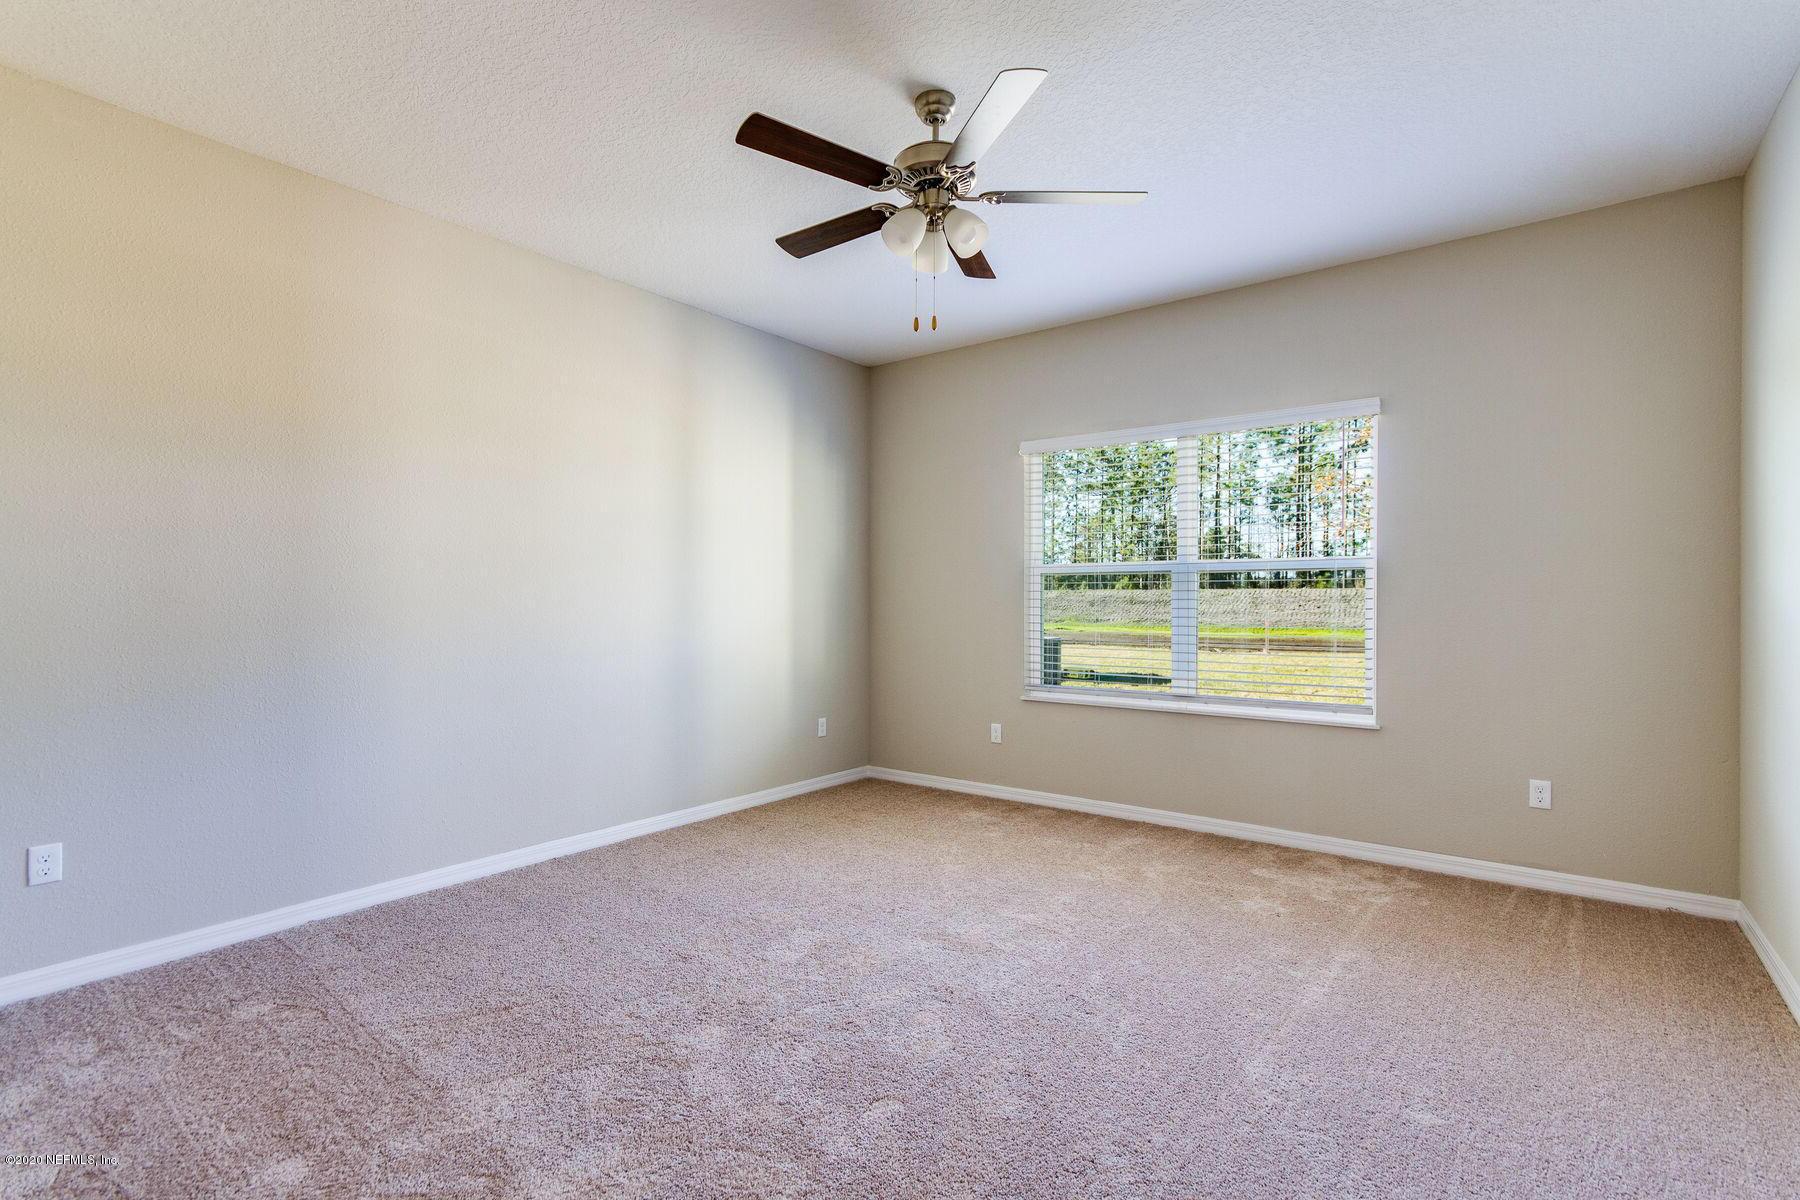 153 BRYBAR, ST AUGUSTINE, FLORIDA 32095, 3 Bedrooms Bedrooms, ,2 BathroomsBathrooms,Residential,For sale,BRYBAR,1043249